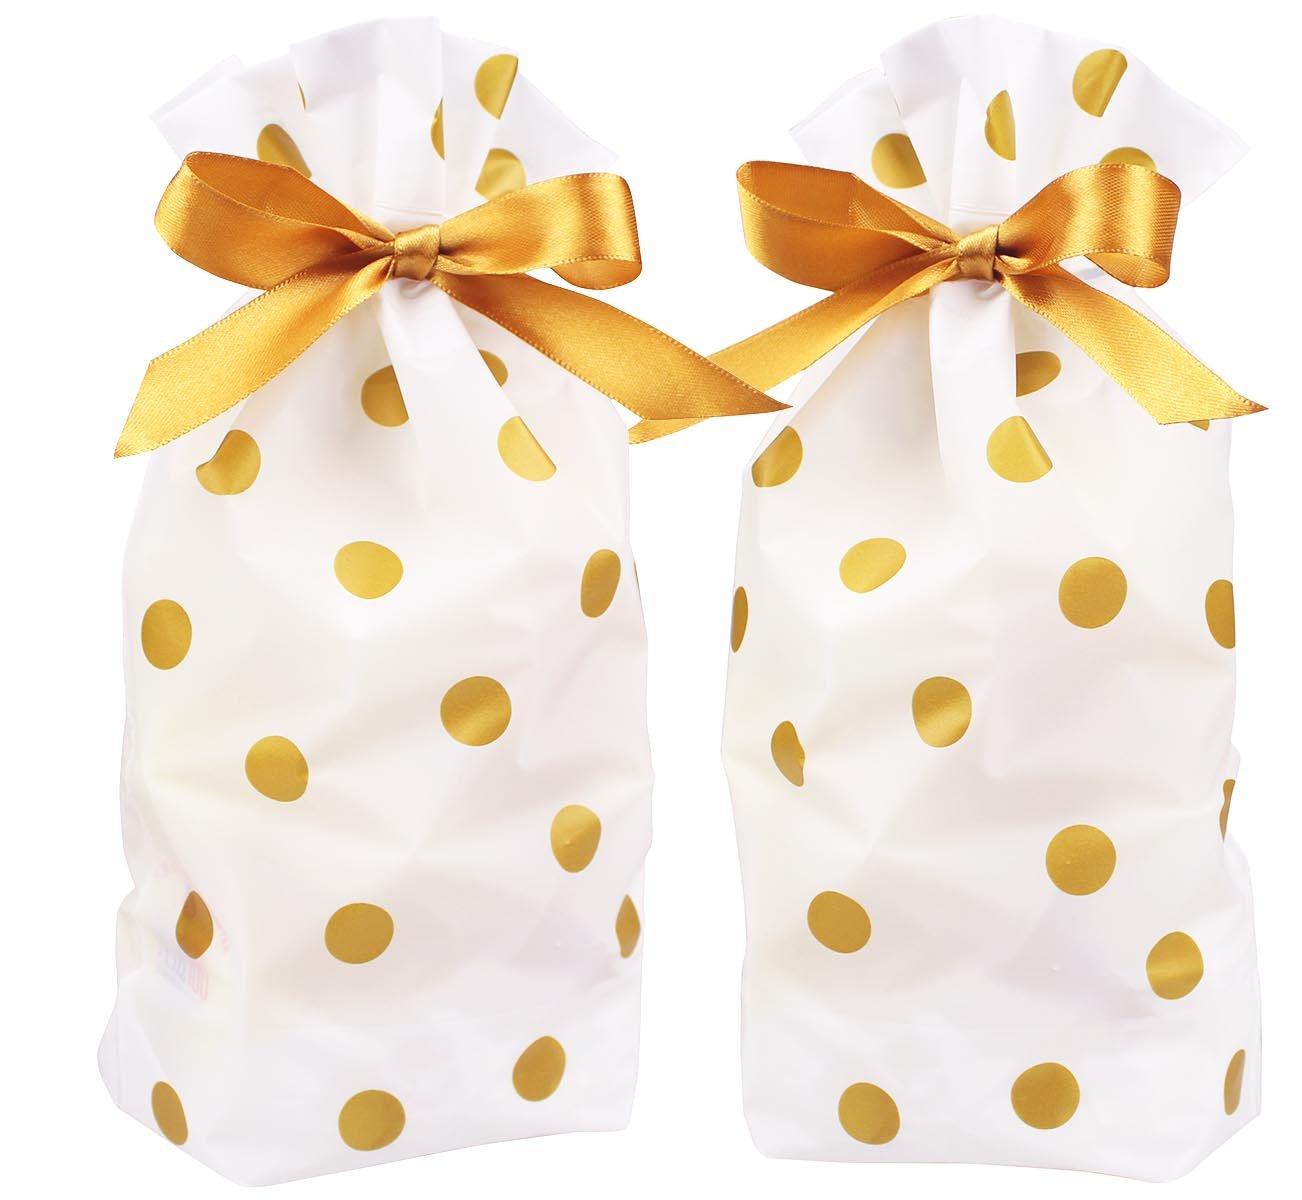 Amazon.com: Zealax 15pcs Treat Bags Gold Polka Dot Print Drawstring ...